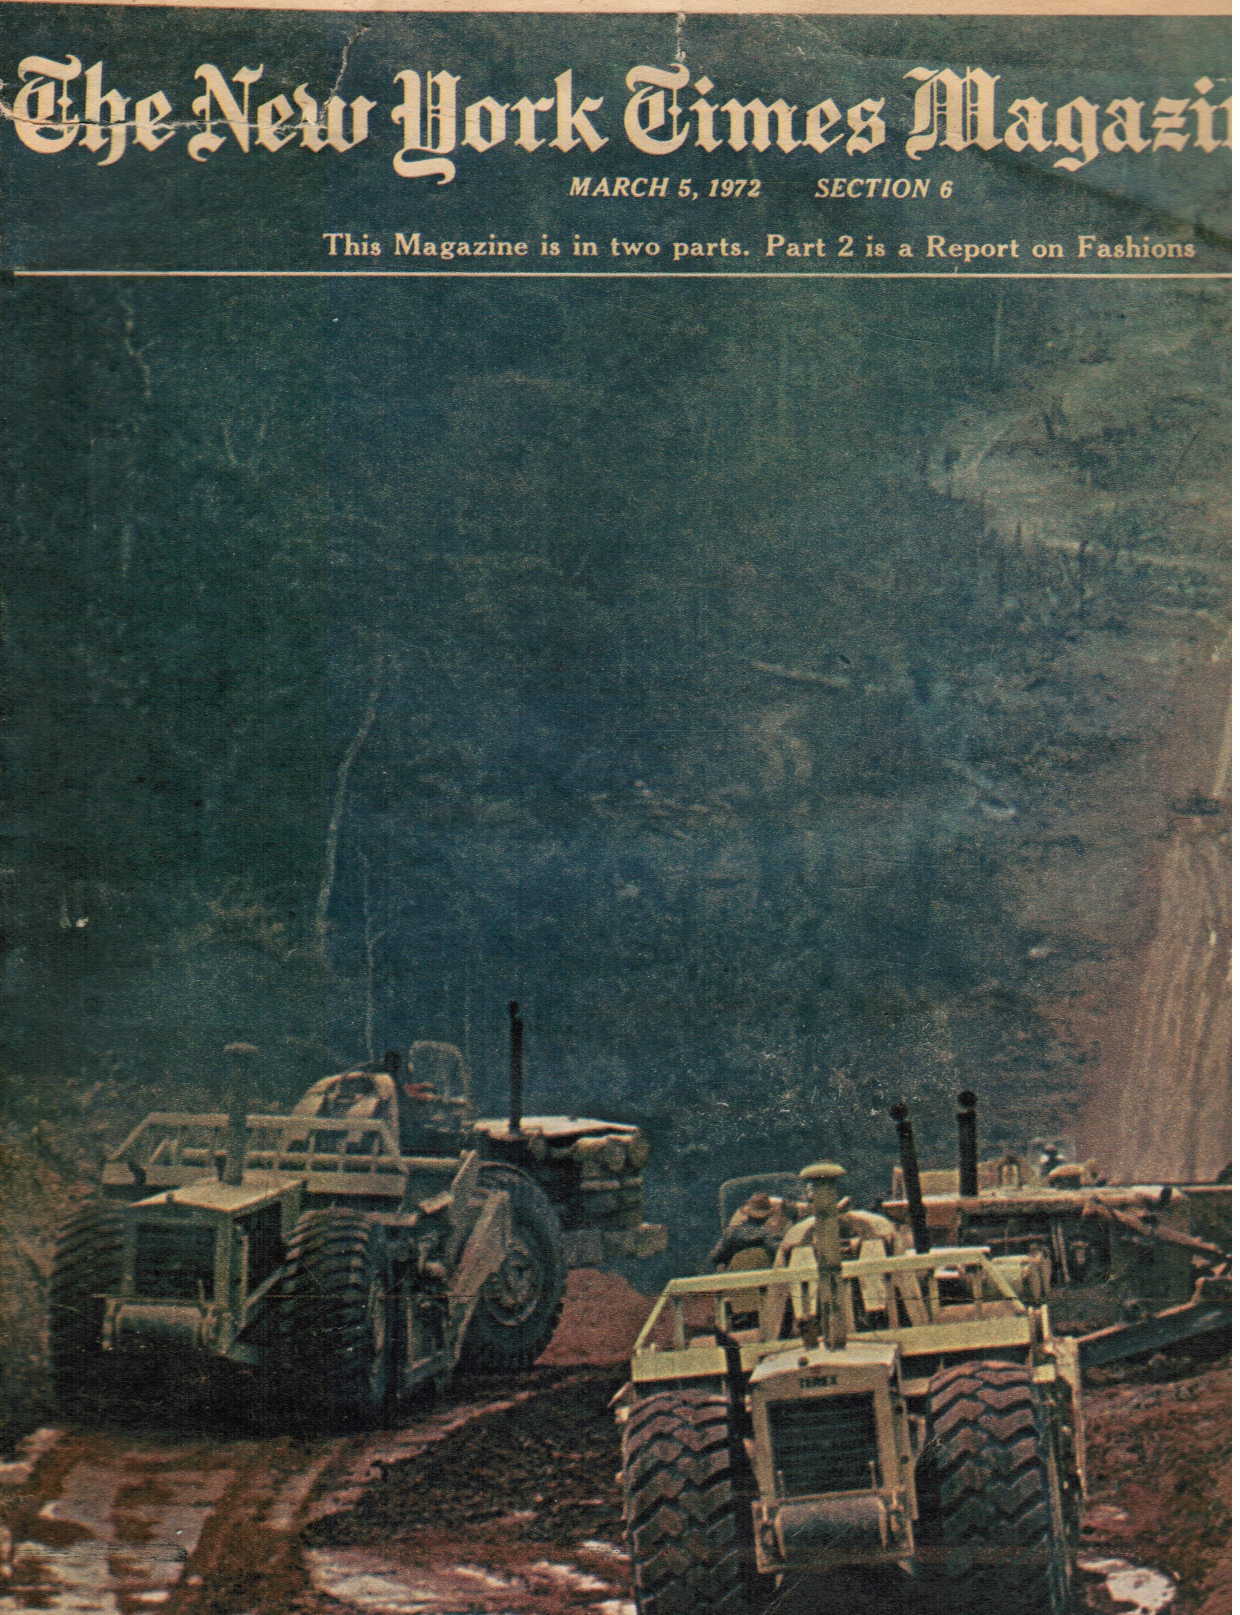 1972 - the New York Times Magazine: March 5, 1972 Amazon Jungle (Cover)